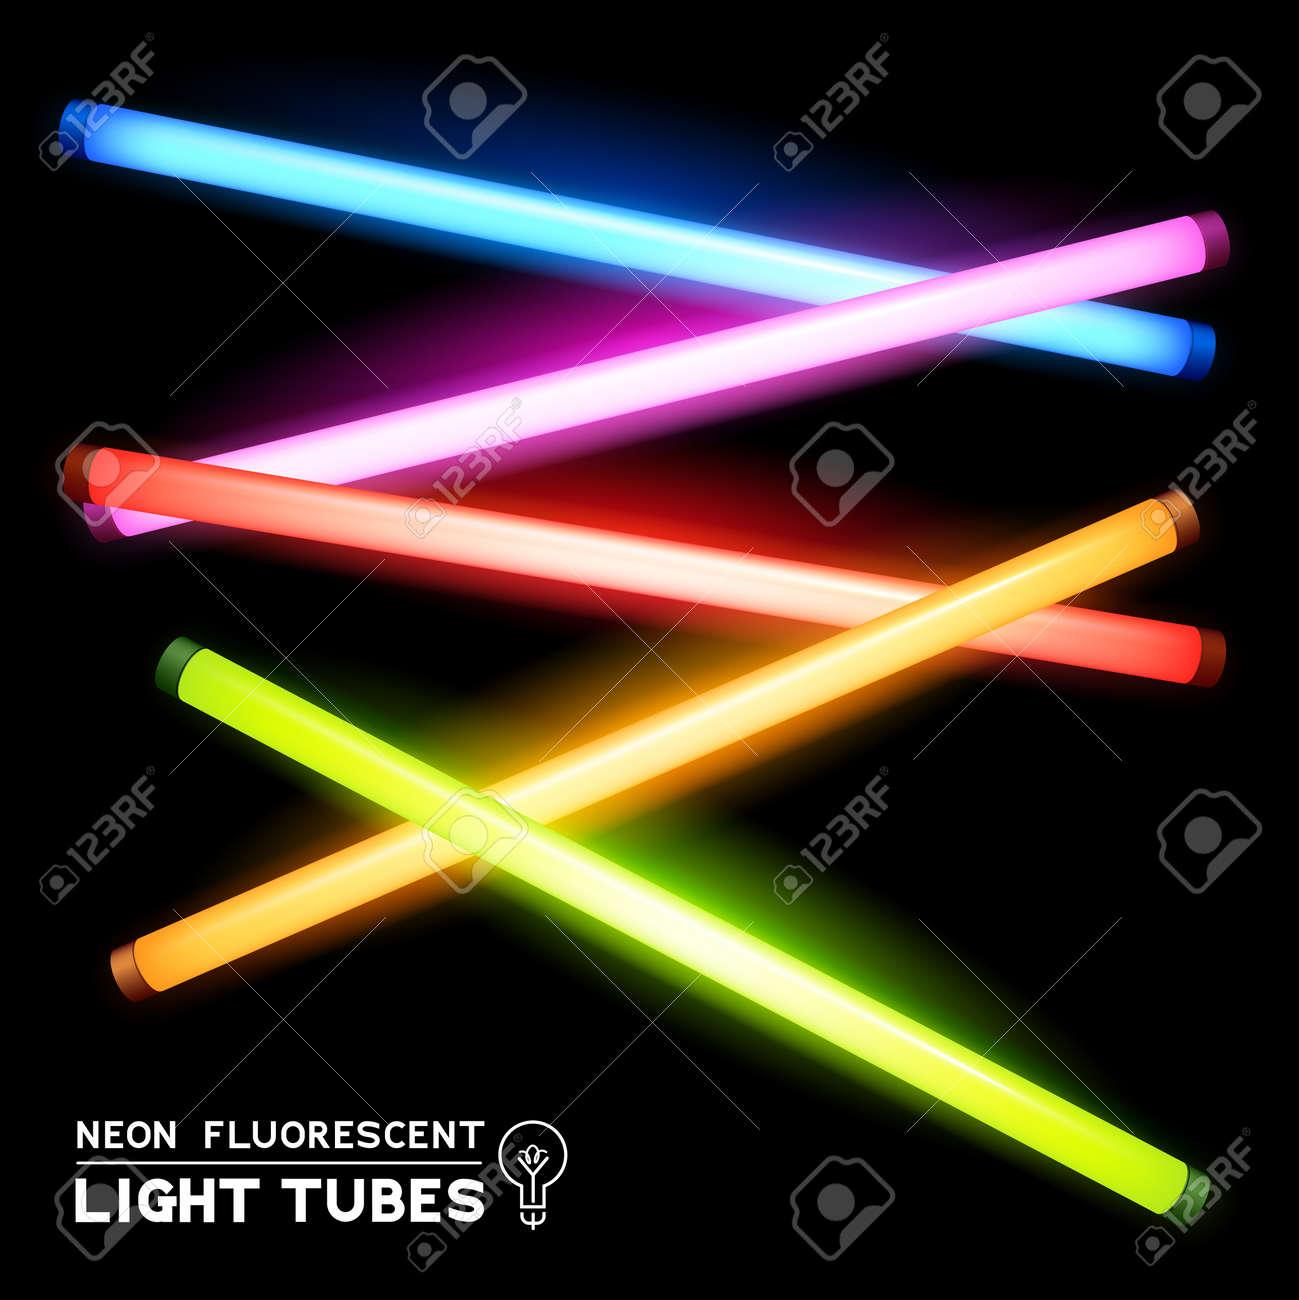 Neon fluorescent light tubes light strips royalty free cliparts neon fluorescent light tubes light strips stock vector 25636219 aloadofball Image collections